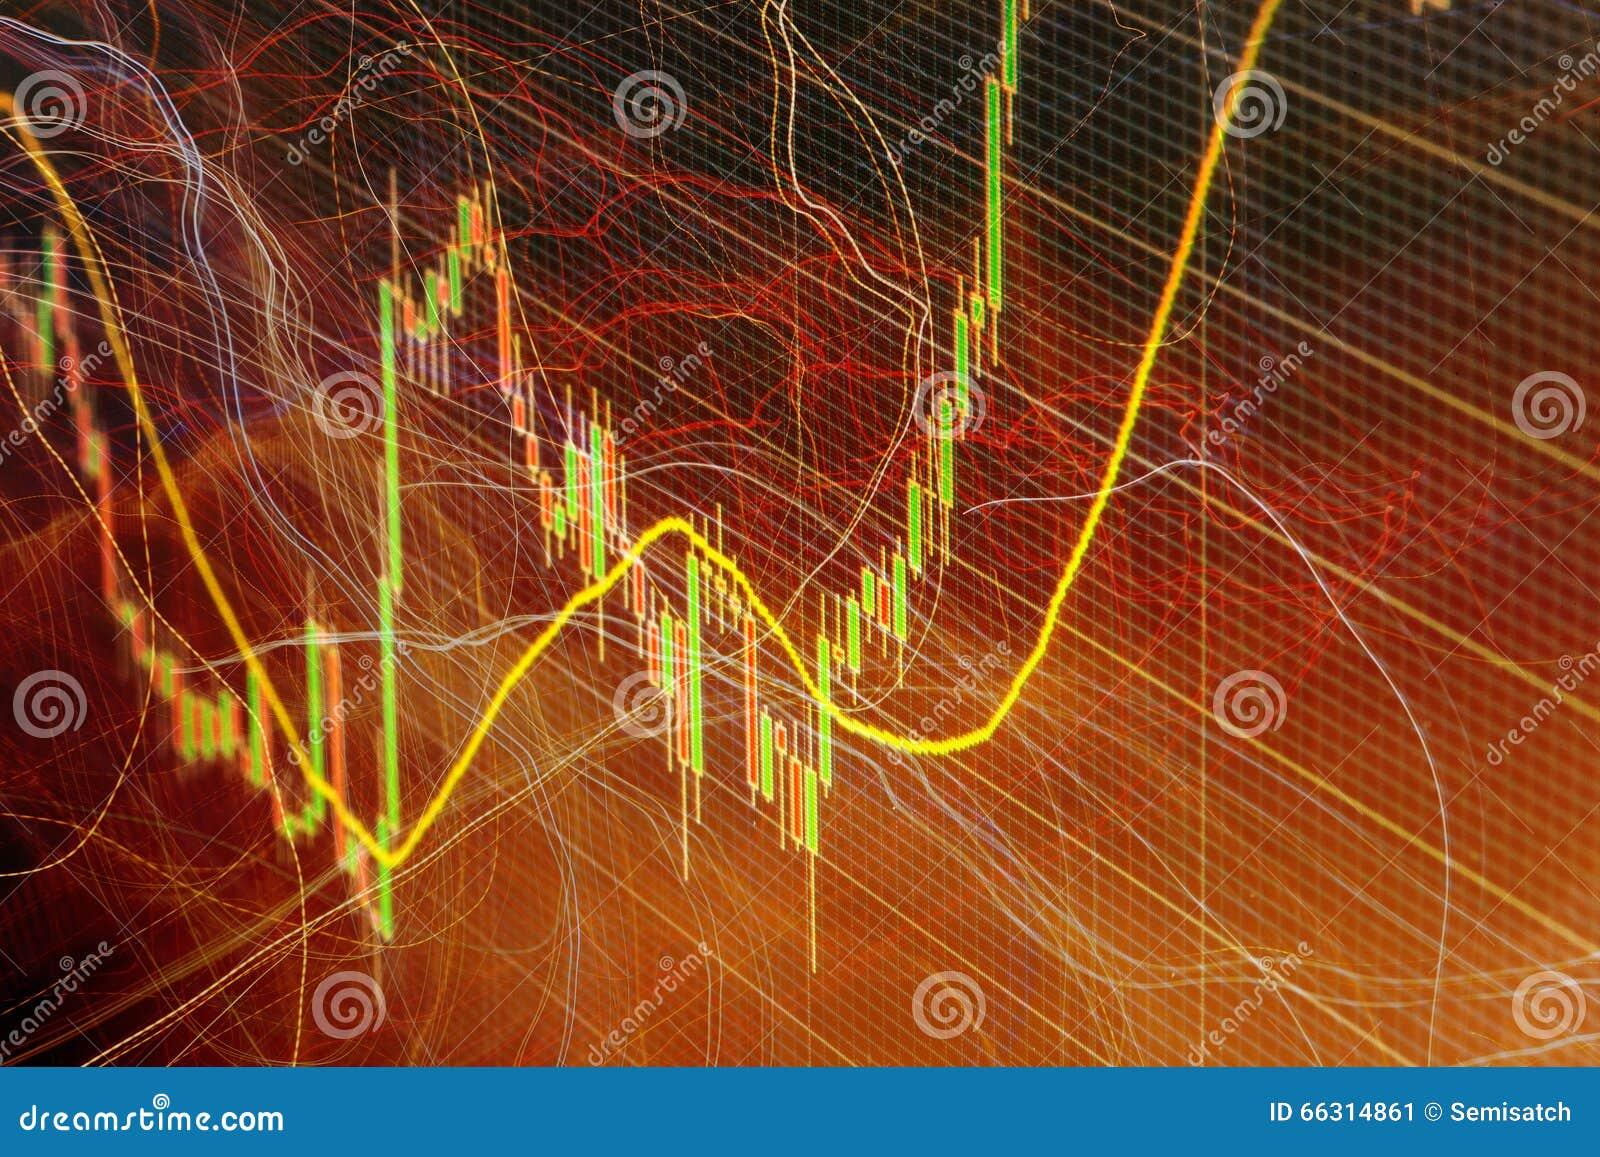 Forex trading symbols